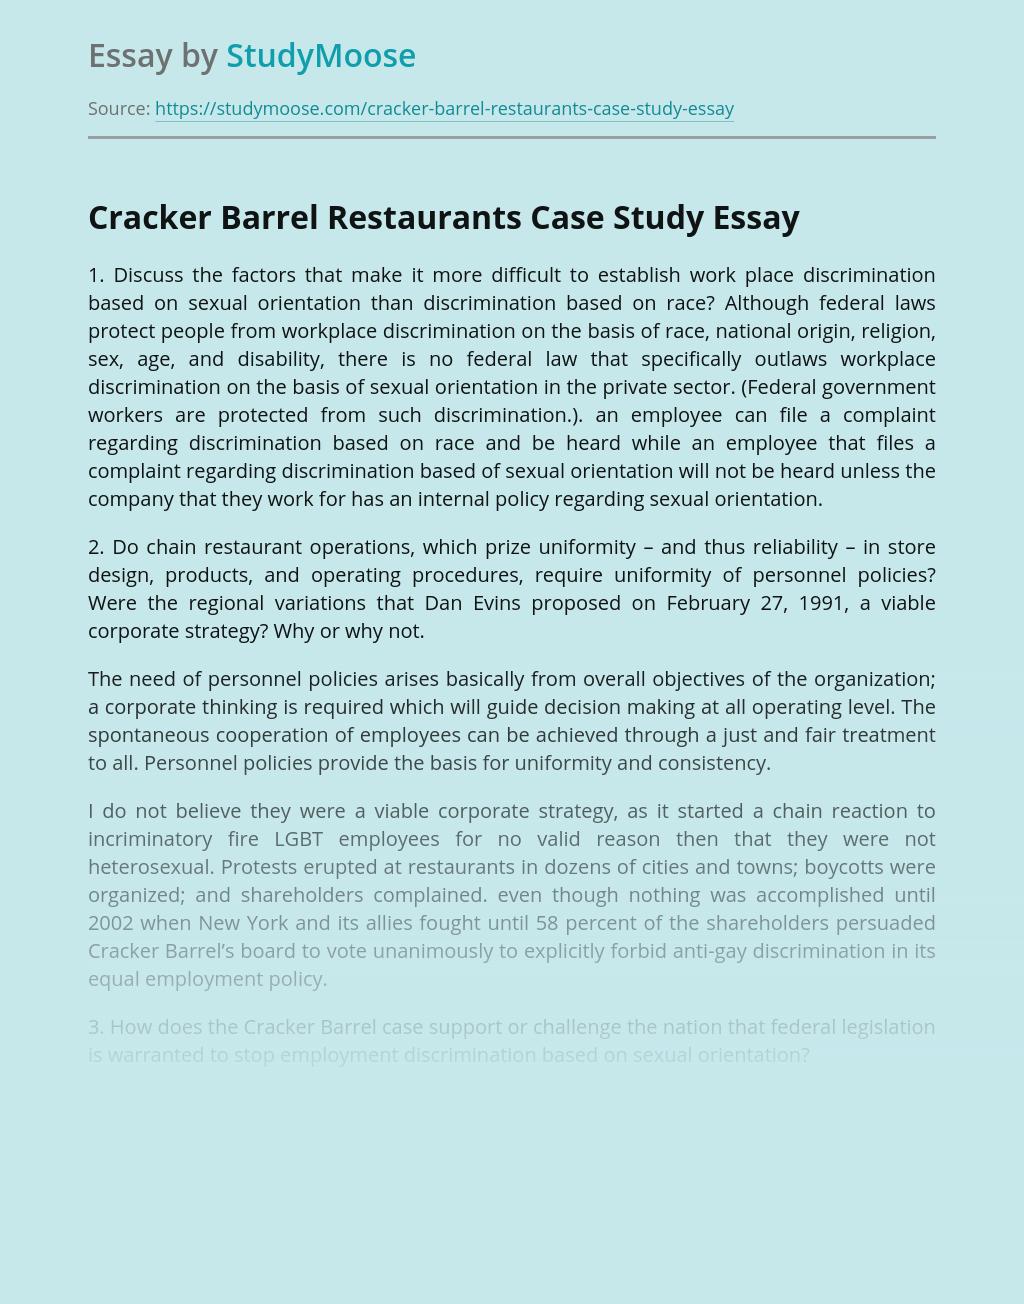 Cracker Barrel Restaurants Case Study